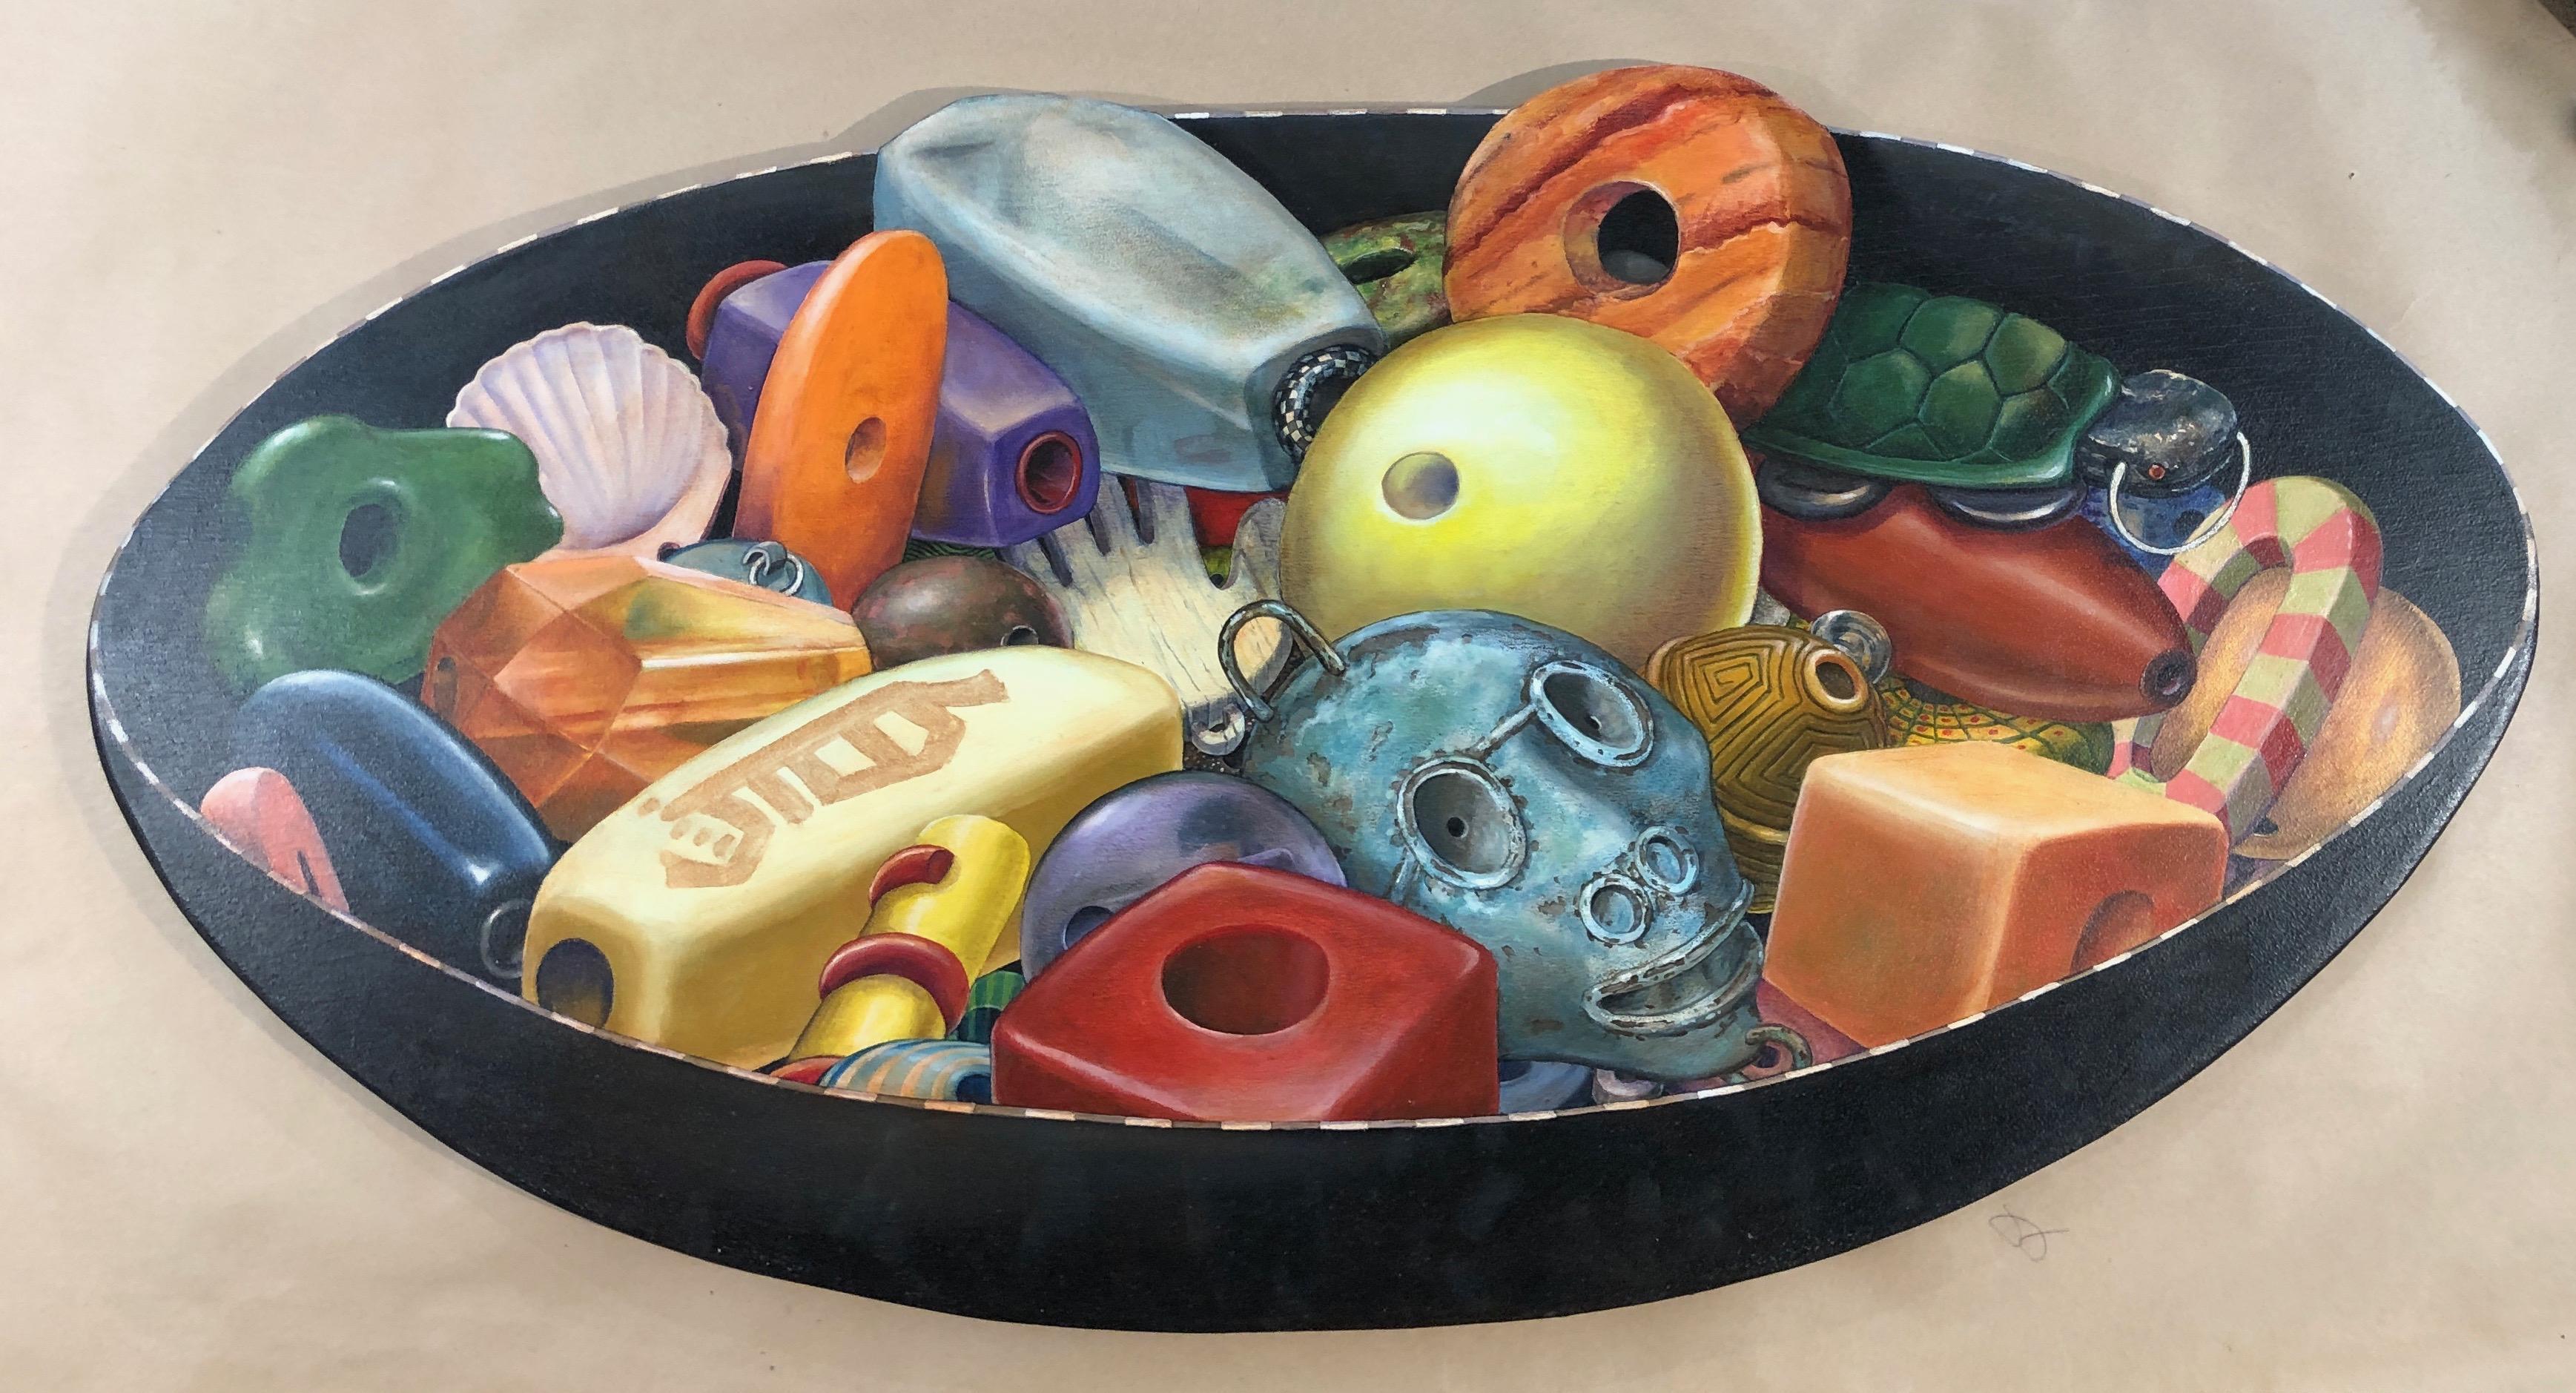 Bowl of Beads,trompe l'oeil painting on birch wood panel, black, green, orange